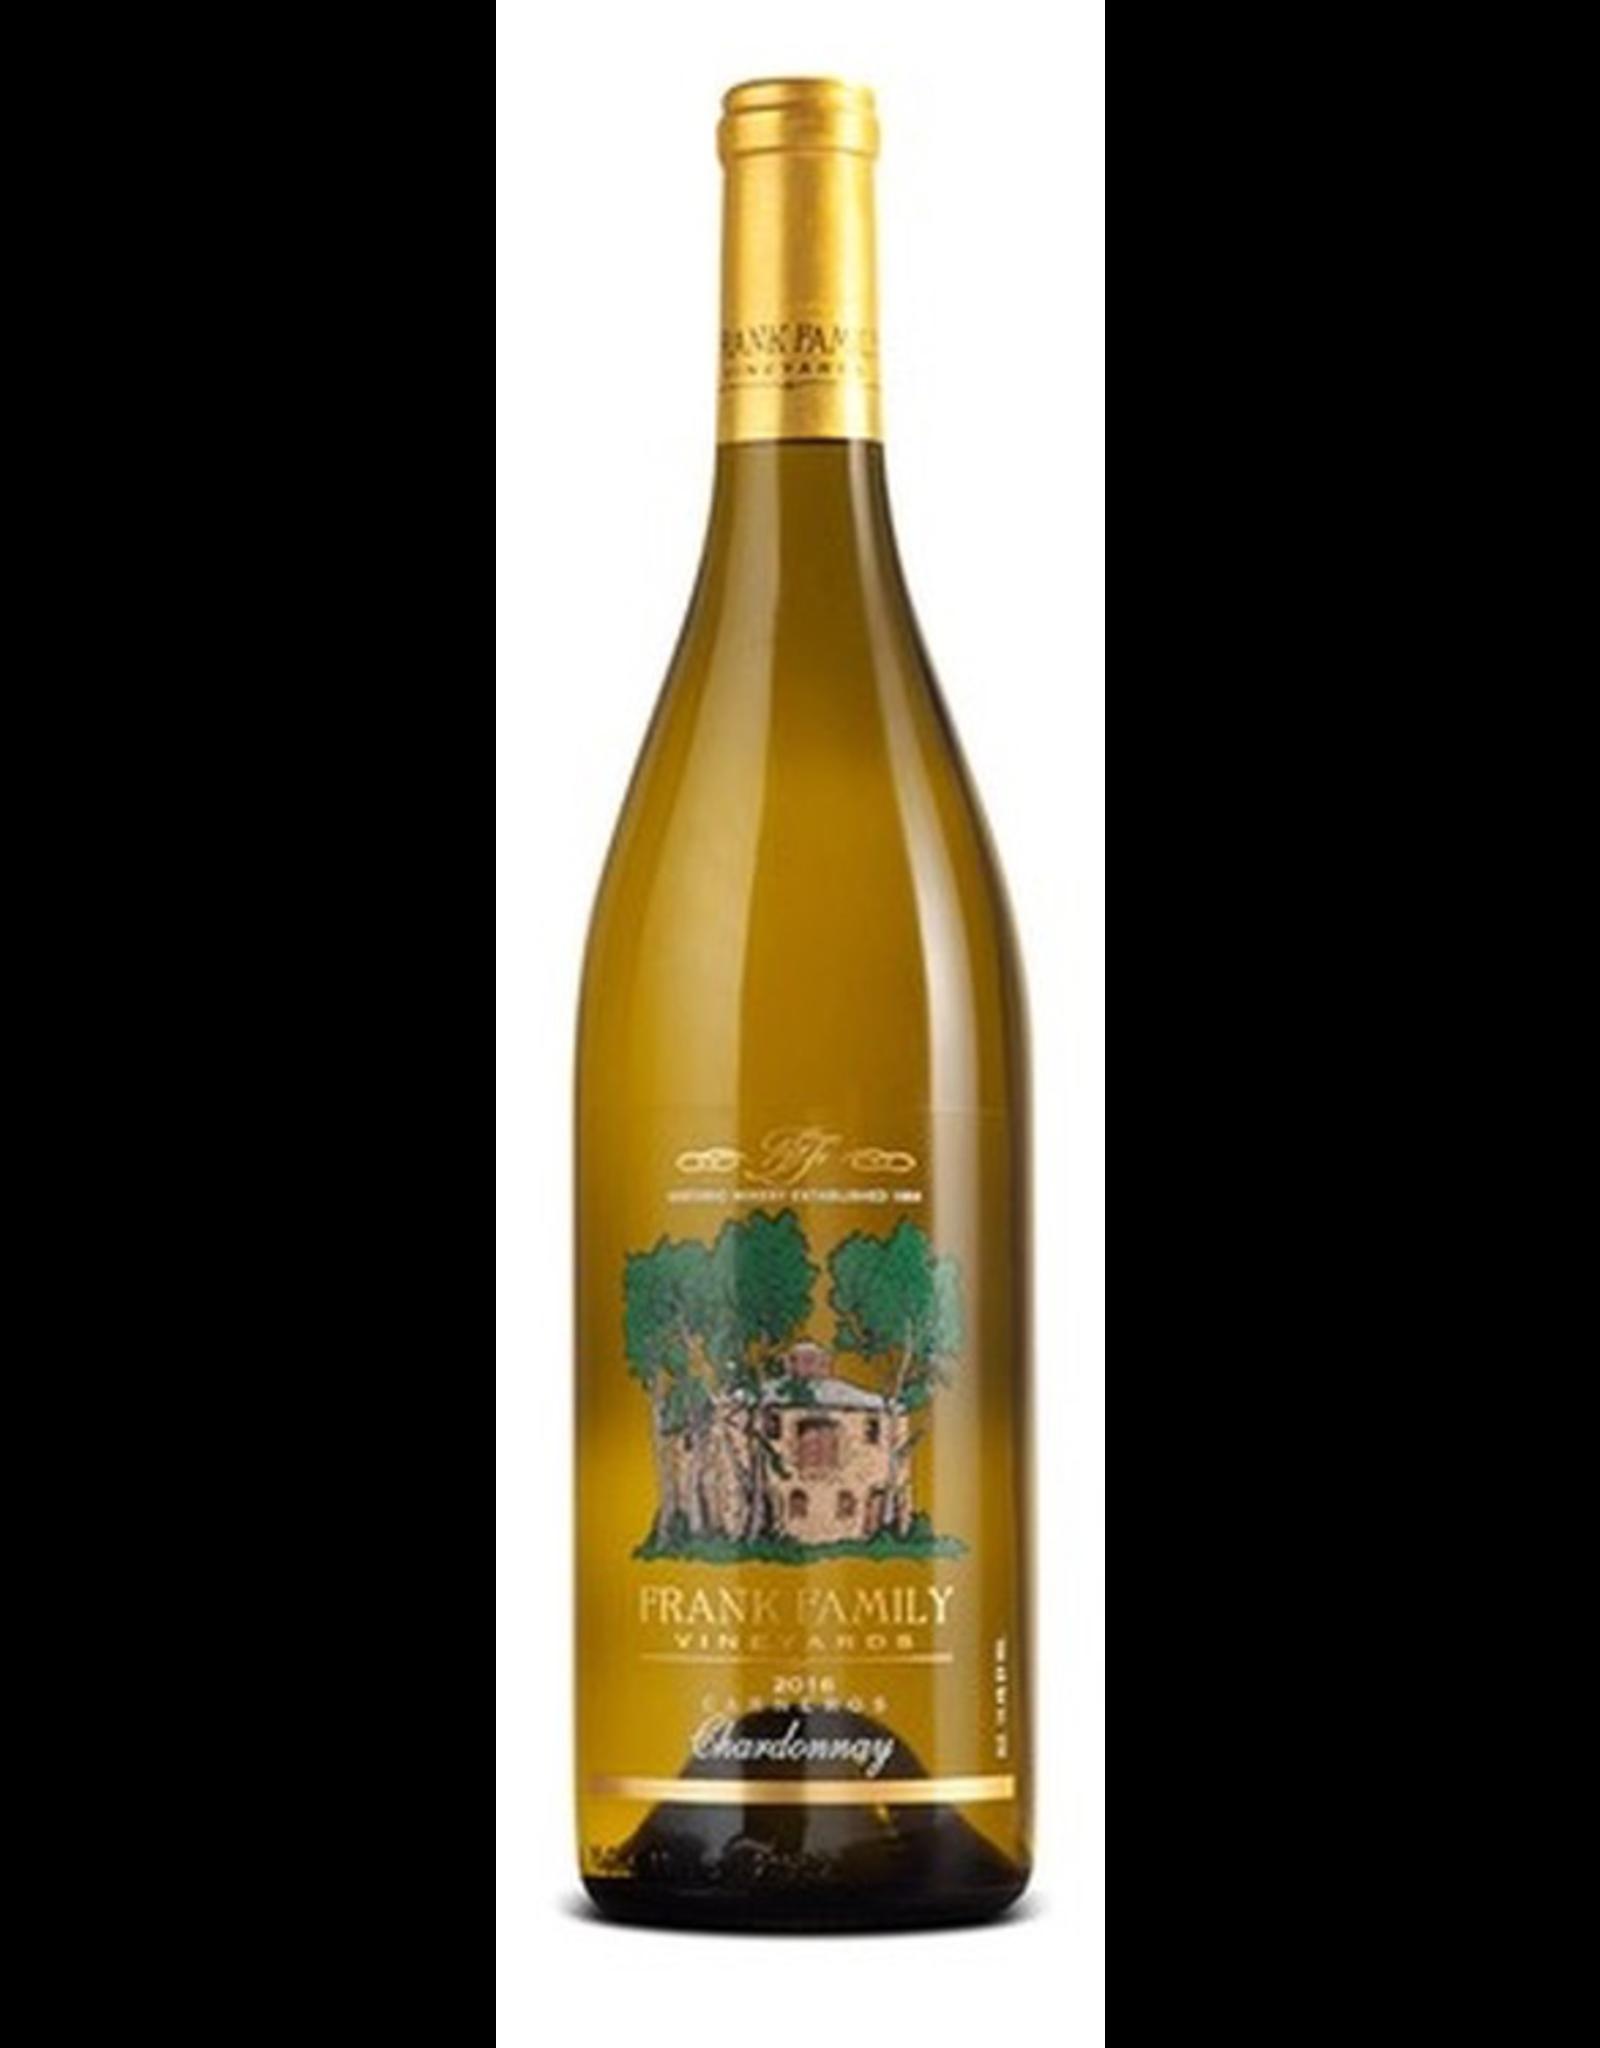 White Wine 2018, Frank Family Vineyards, Chardonnay, Carneros, Napa/ Sonoma Counties, California, 14.4% Alc, CTnr, TW90